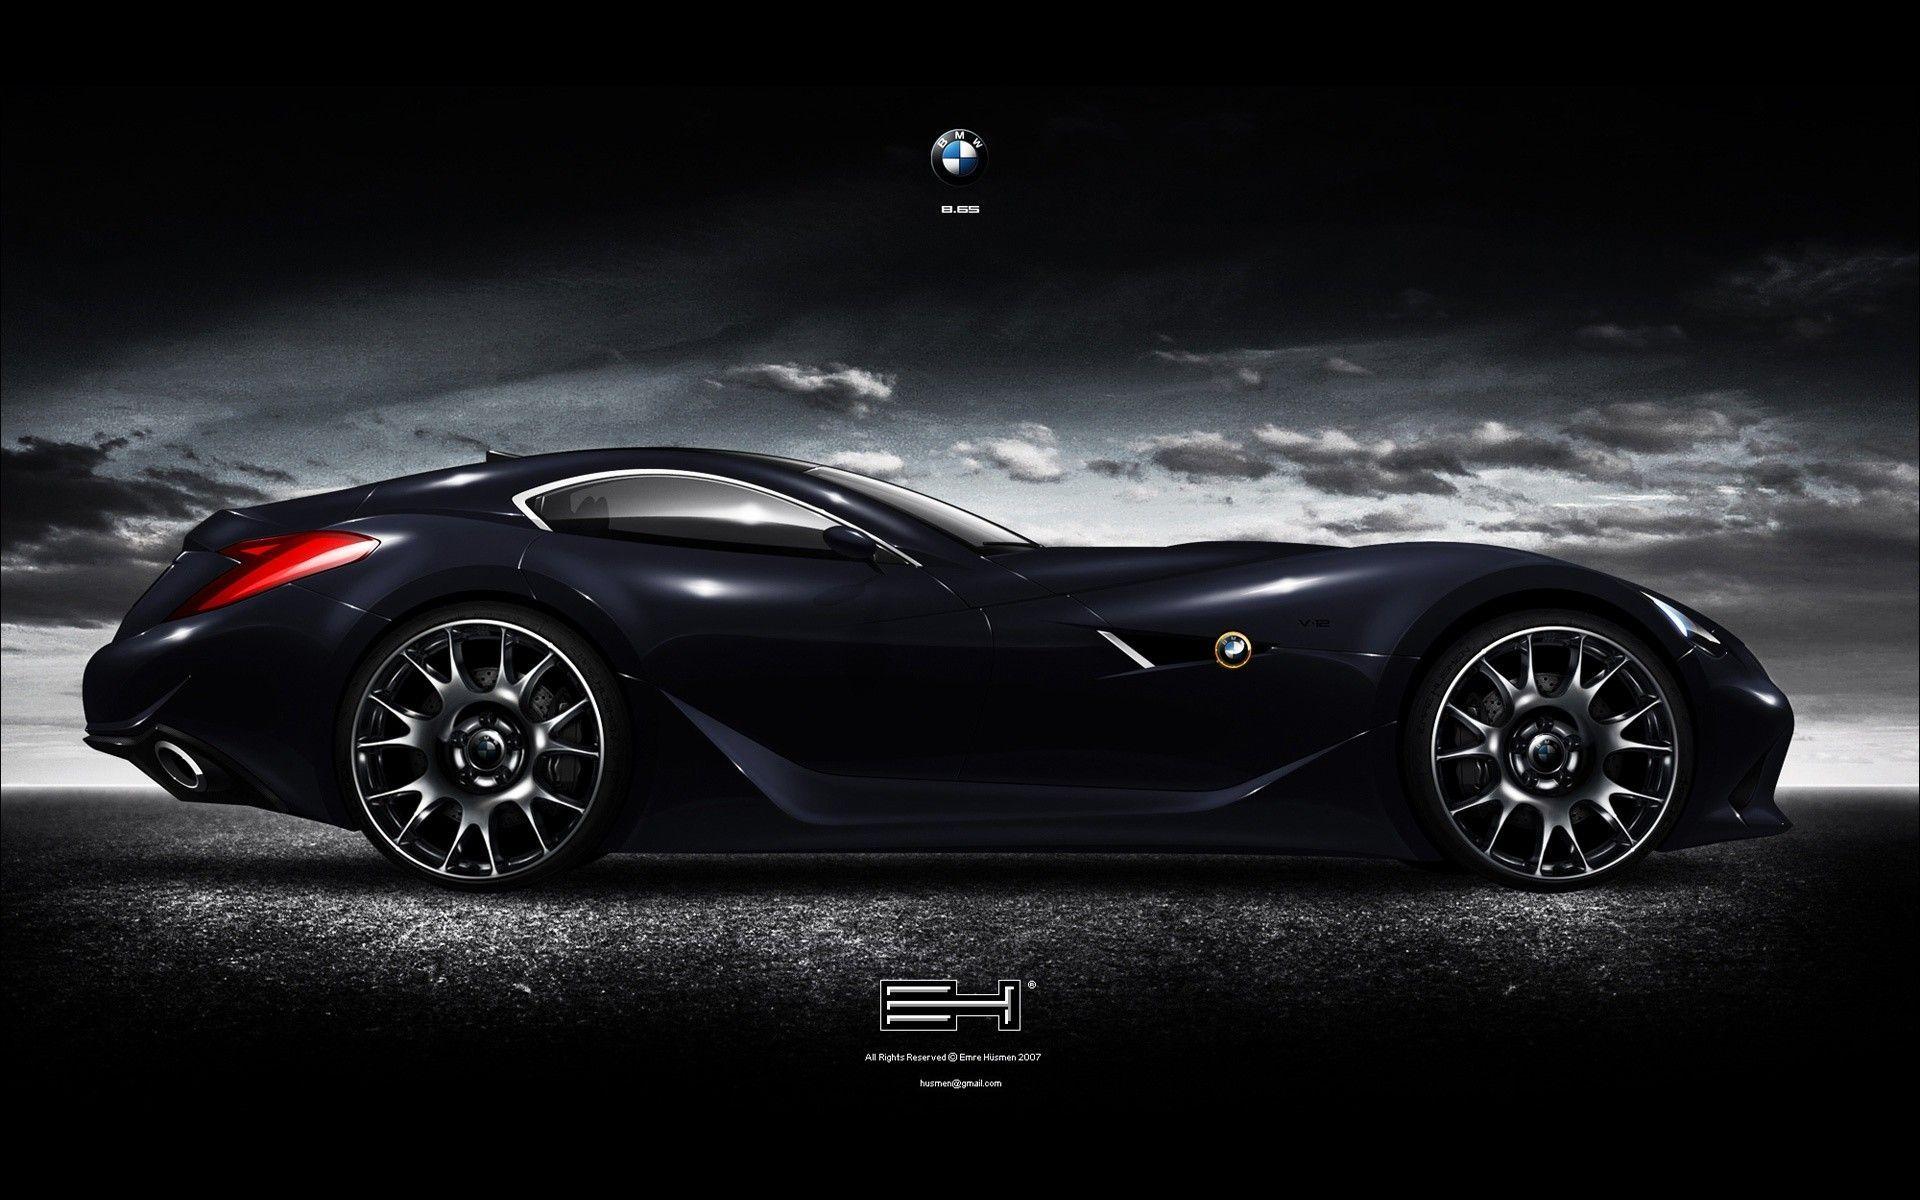 Image Result For Windows 10 Super Hd Wallpaper Bmw Concept Car Concept Cars Bmw Concept